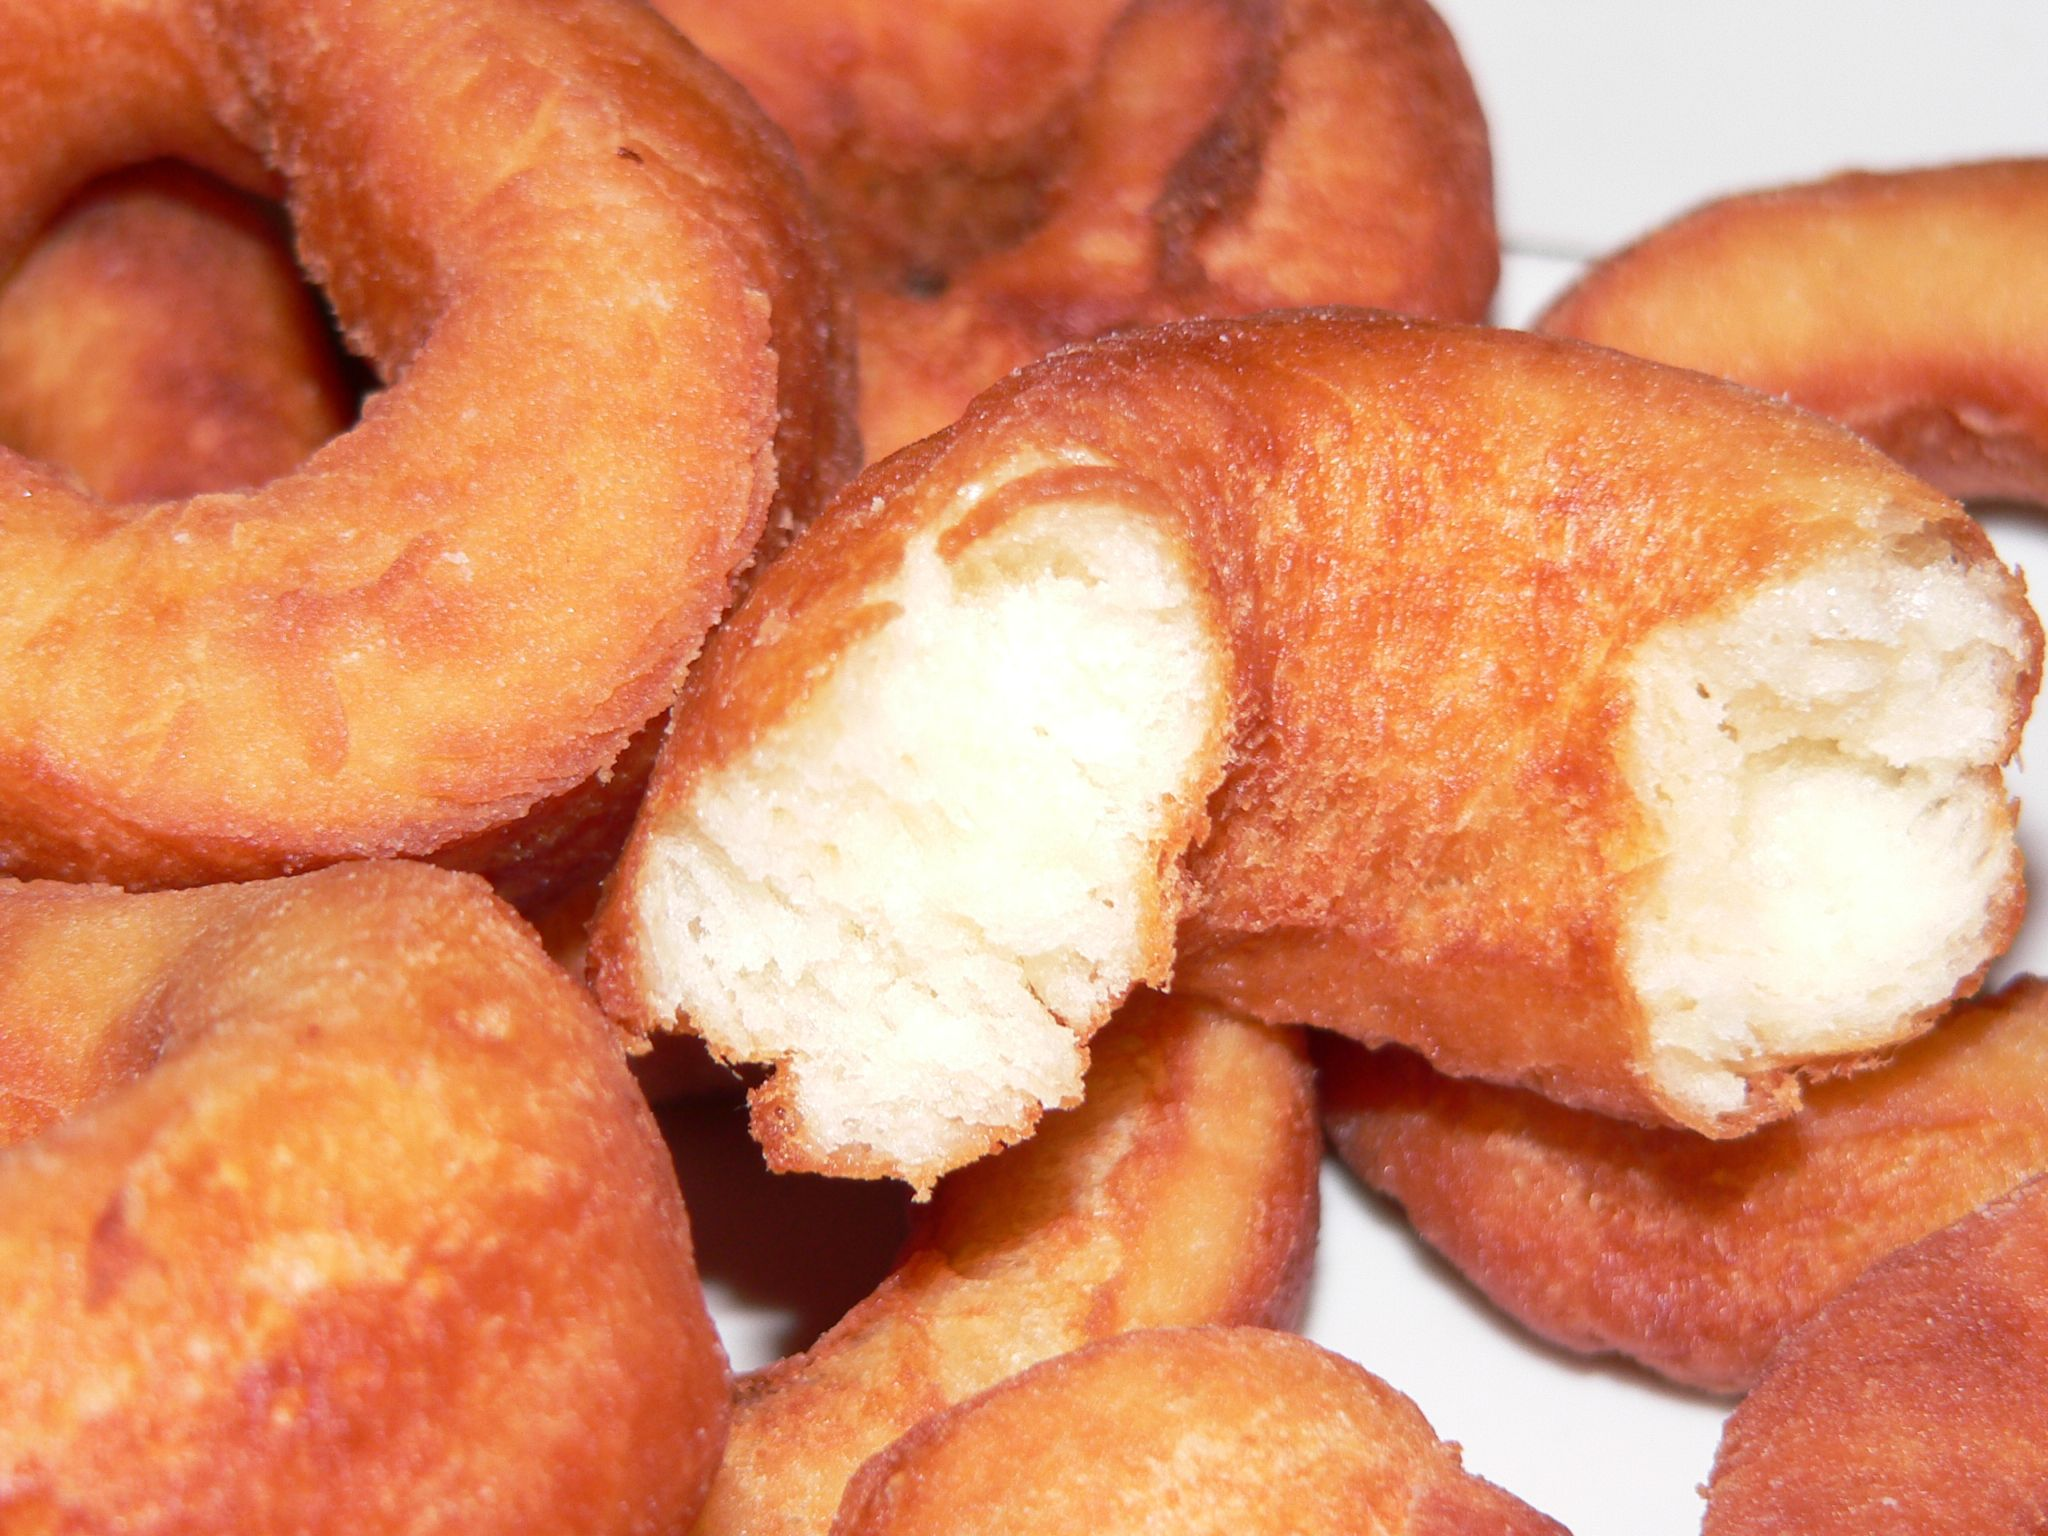 Curd doughnuts